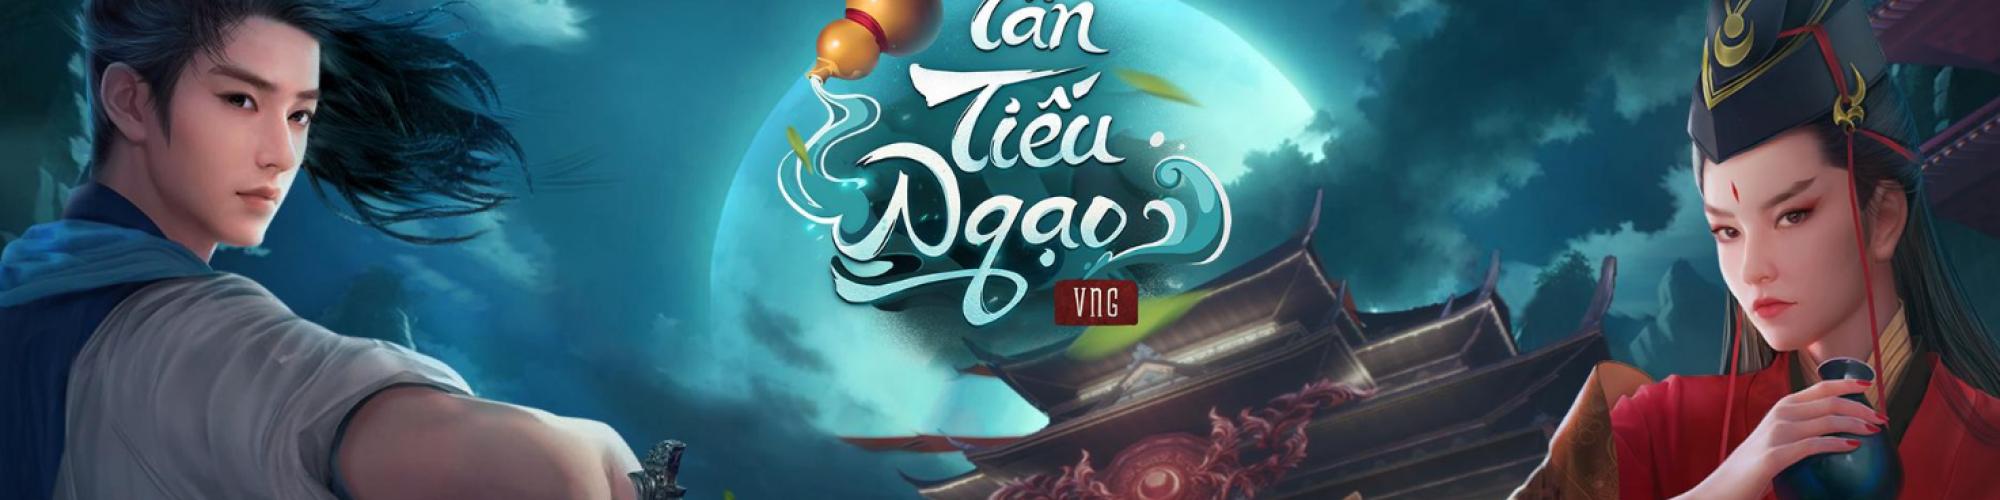 tan-tieu-ngao-vng-game4v